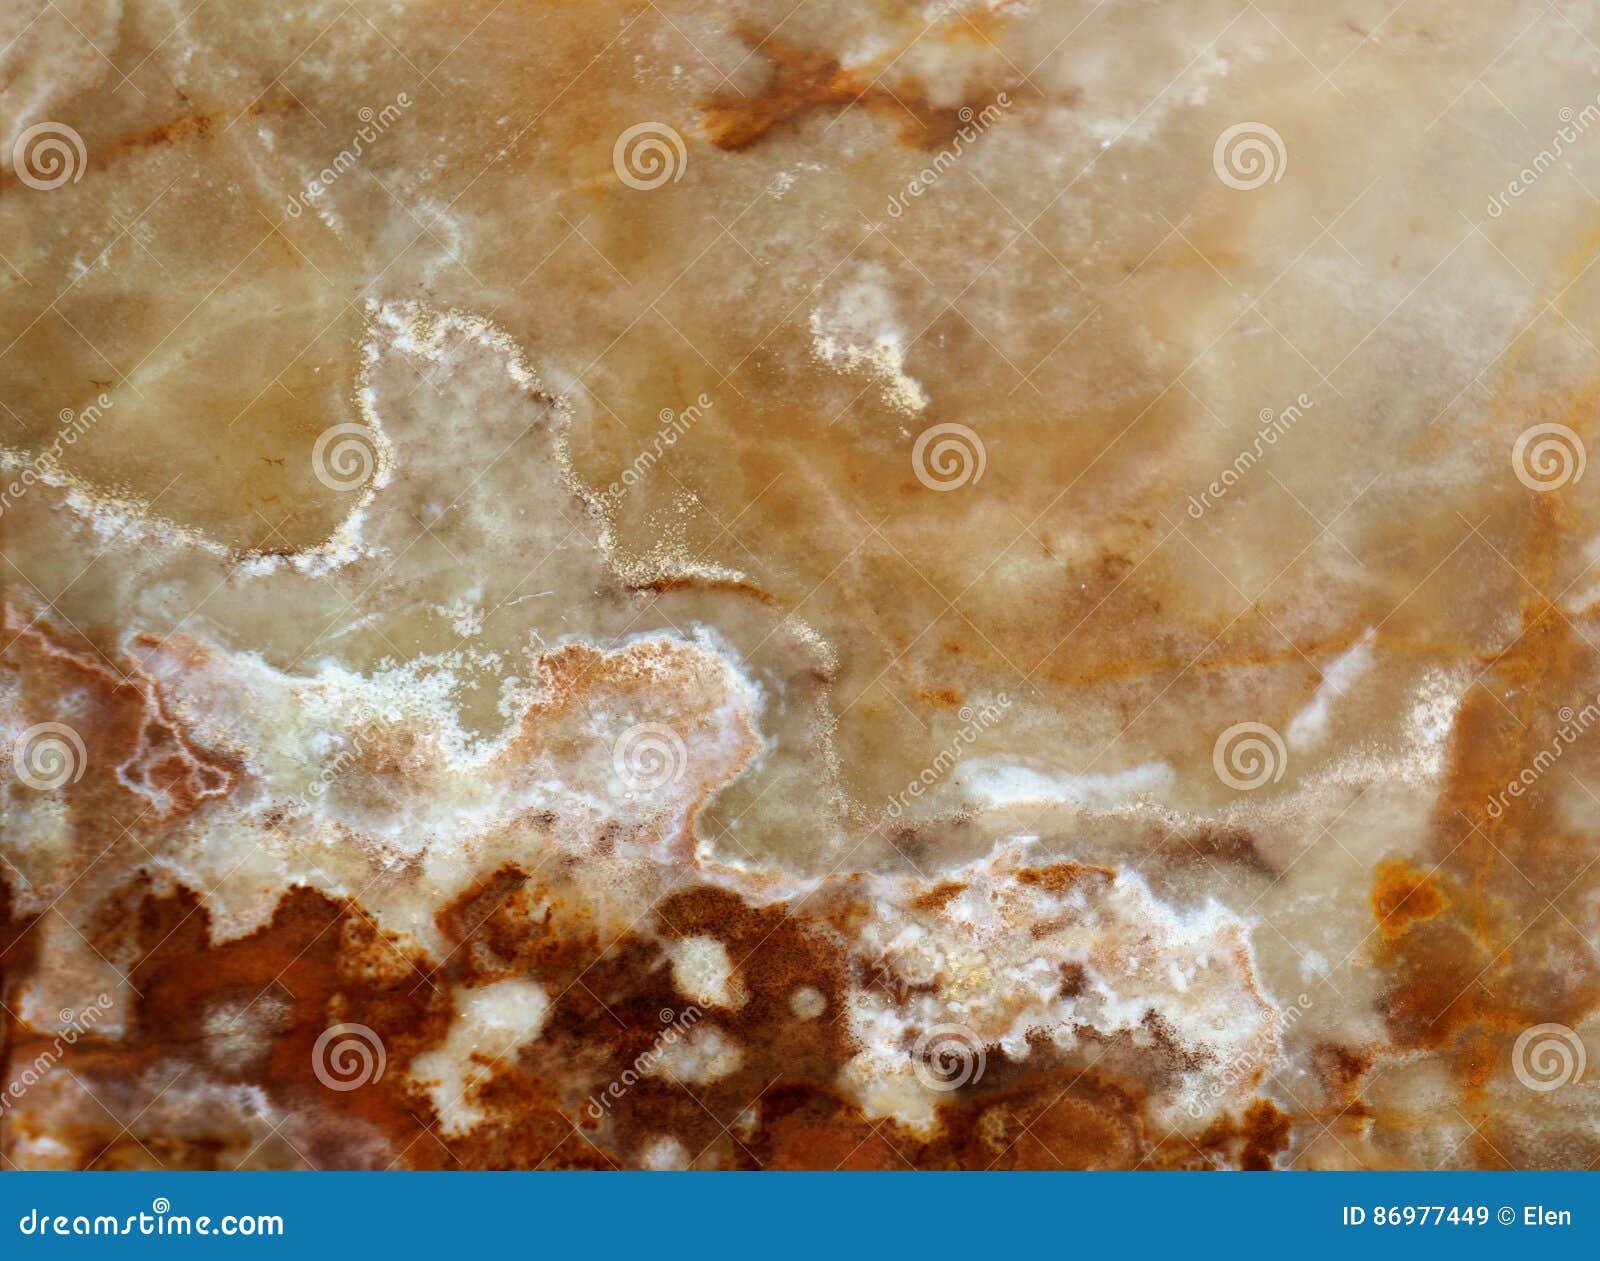 Macro texture of nature - onyx stone